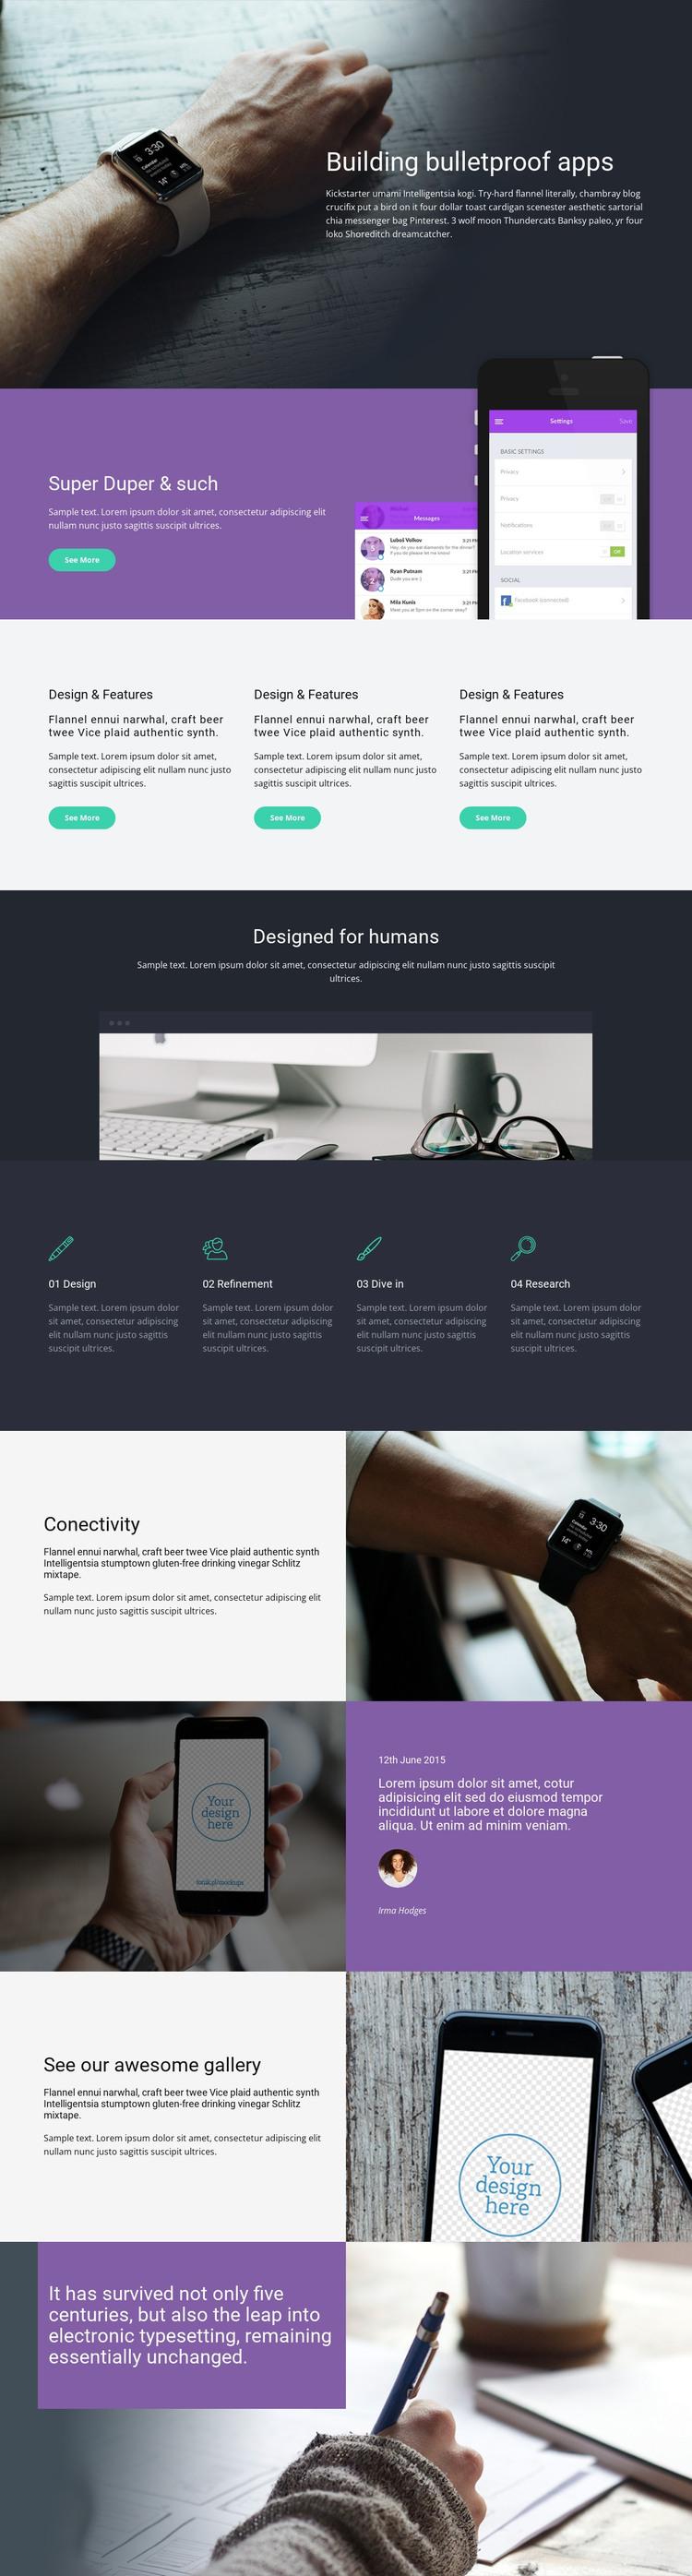 Bulletproof Apps Web Design